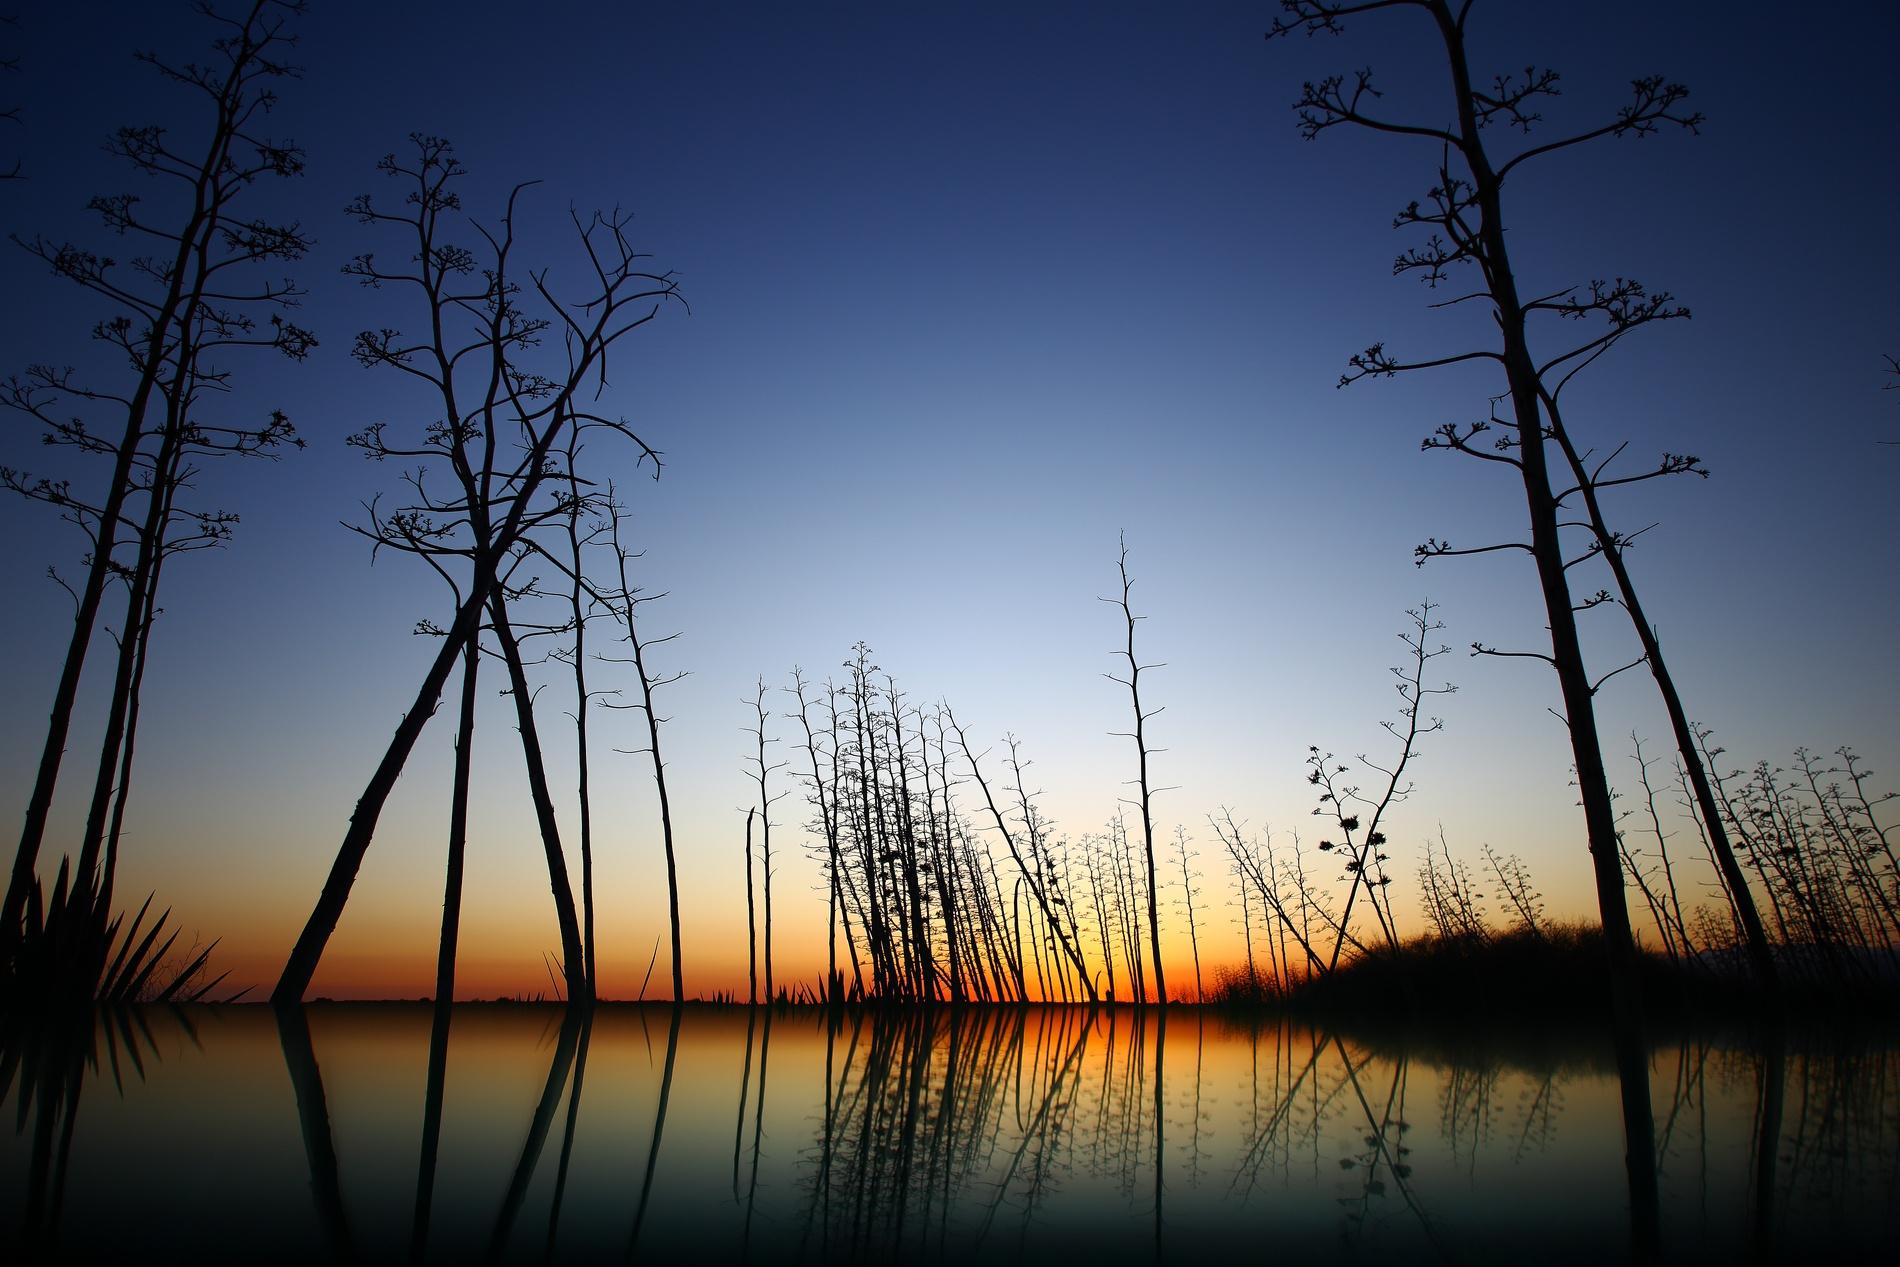 PITAS - David Santiago, Landscape Photography